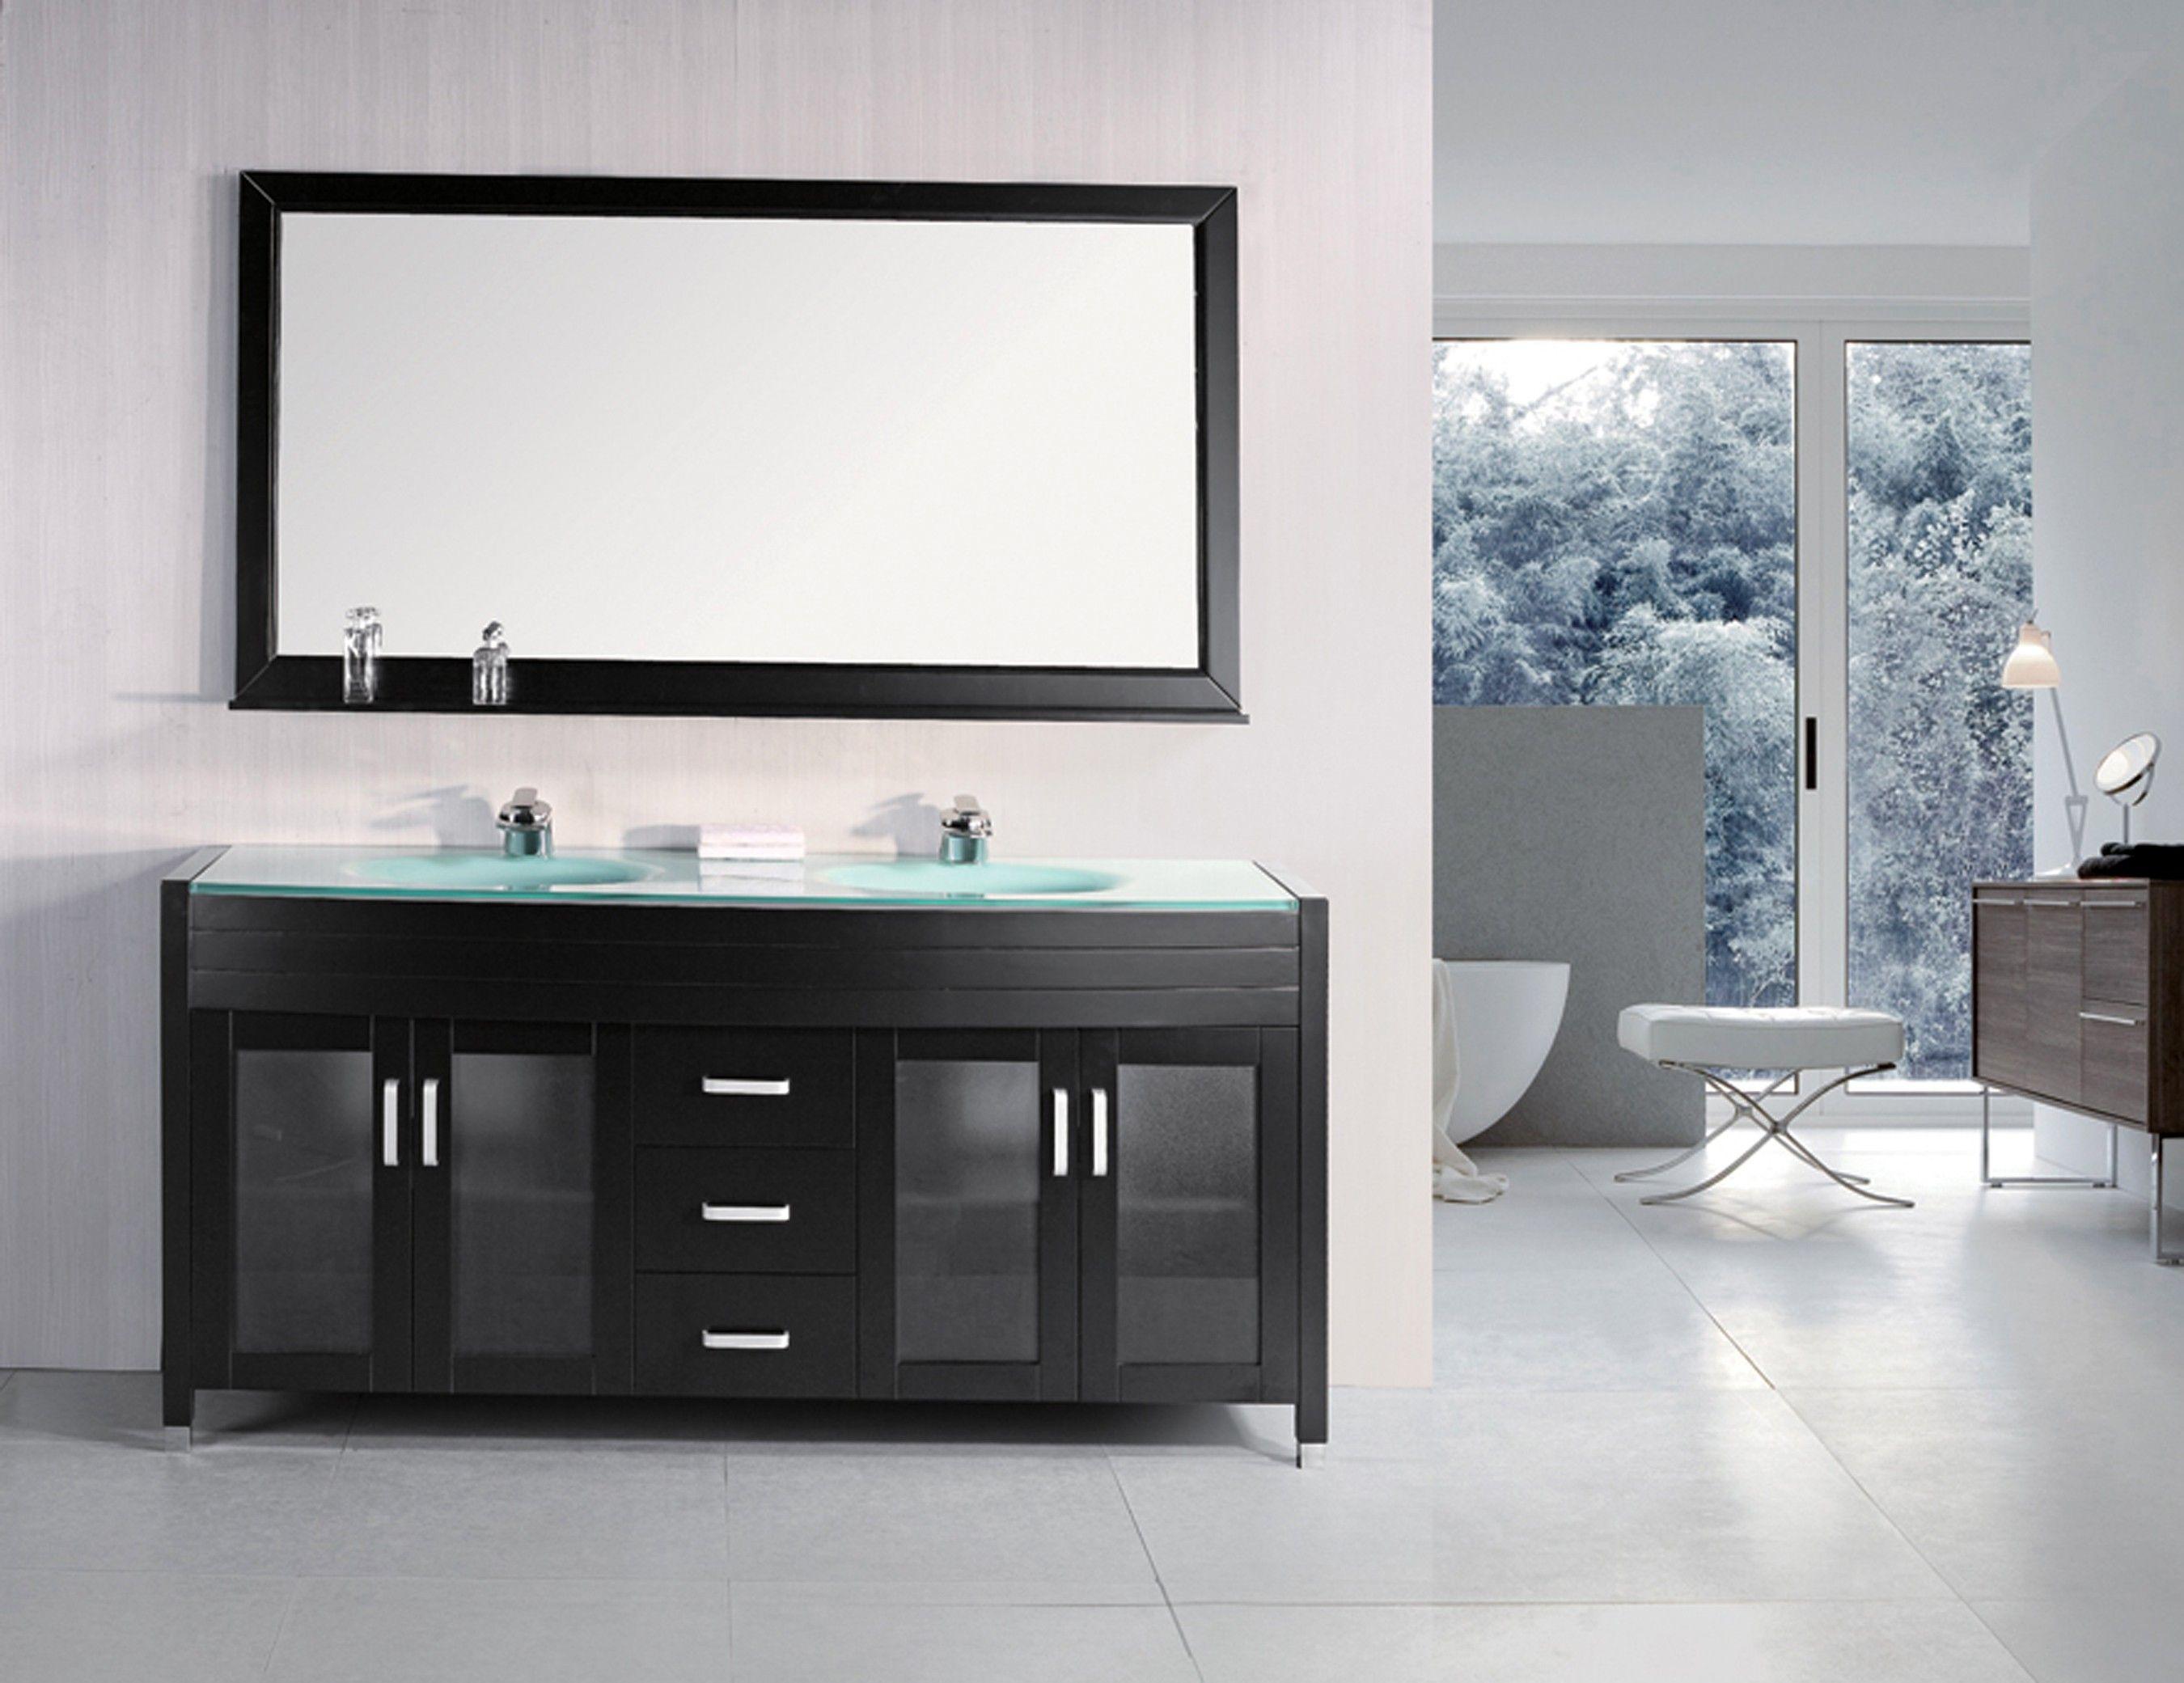 Waterfall White 72 Double Sink Vanity Set Double Sink Vanity Vanity Sink 72 Double Sink Vanity